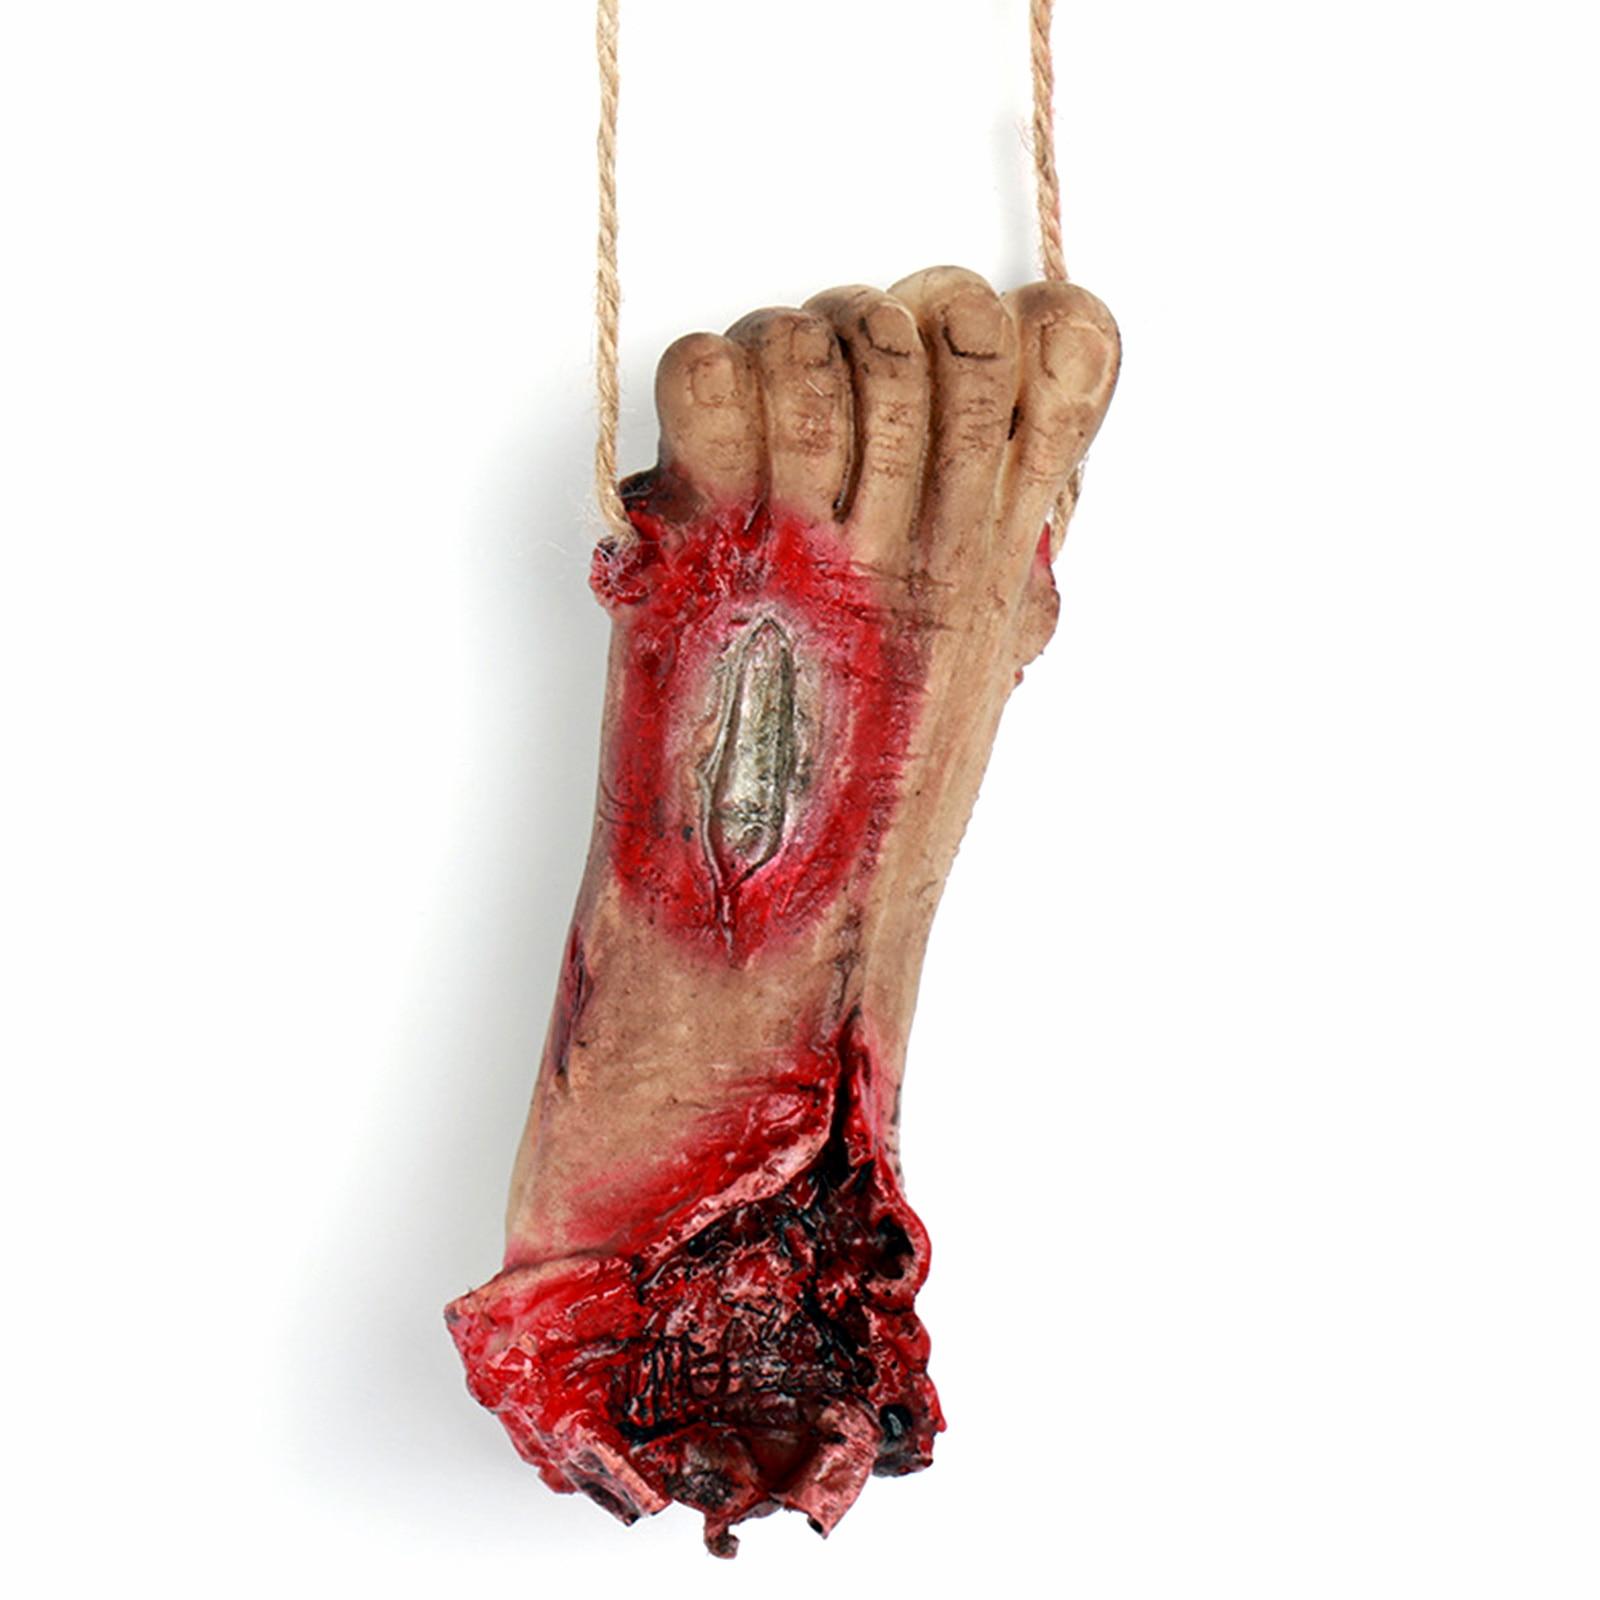 Halloween Decoration Props Horror Realistic Broken Hand Broken Chain Hanging Chain Props Eyeball Broken Hand Party Supplies-in Party DIY Decorations from Home & Garden